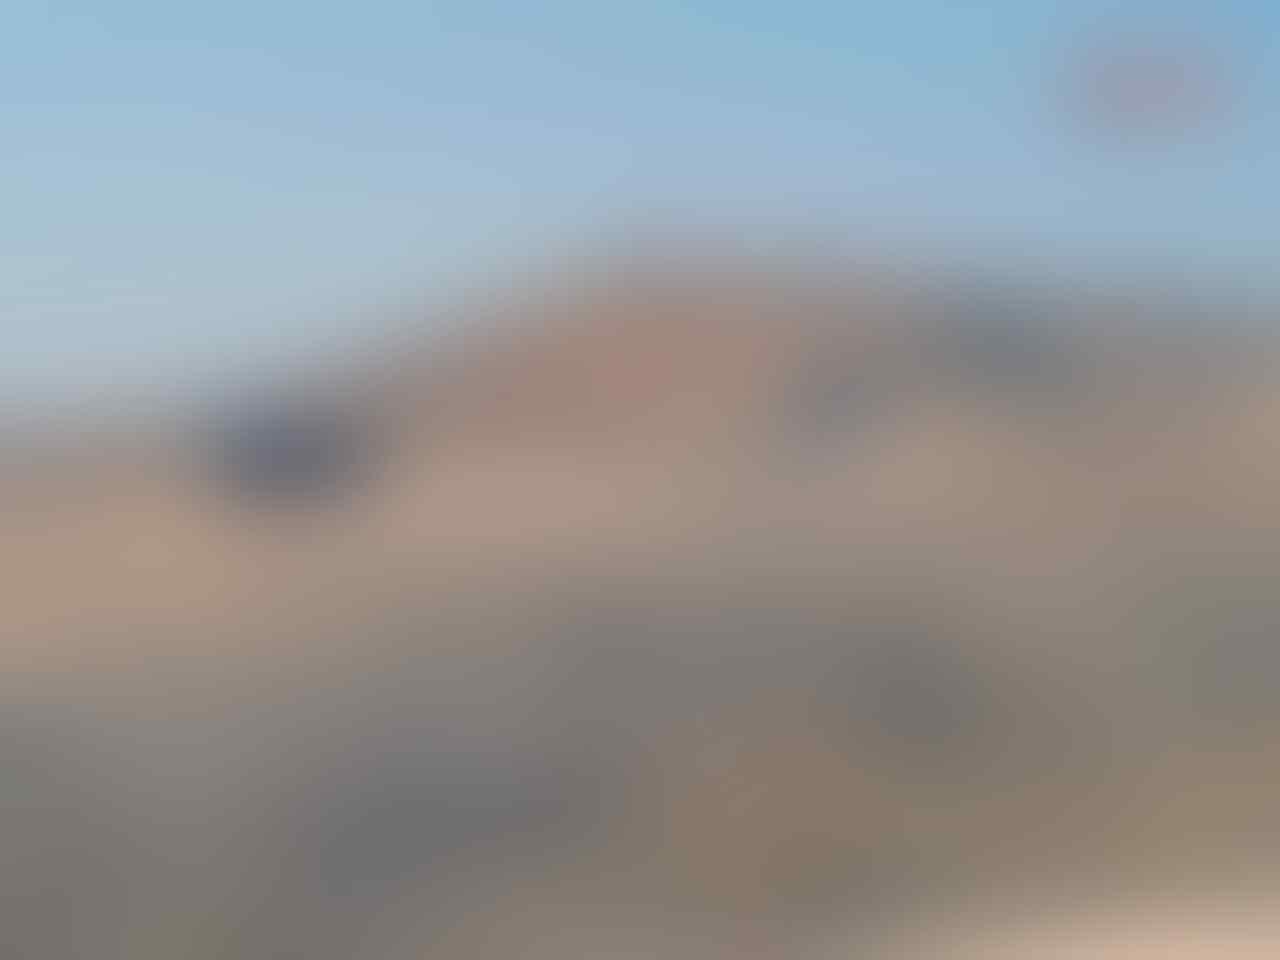 All About Konflik Timur Tengah dan Afrika Utara menghadapi Terorisme part 3 - Part 6